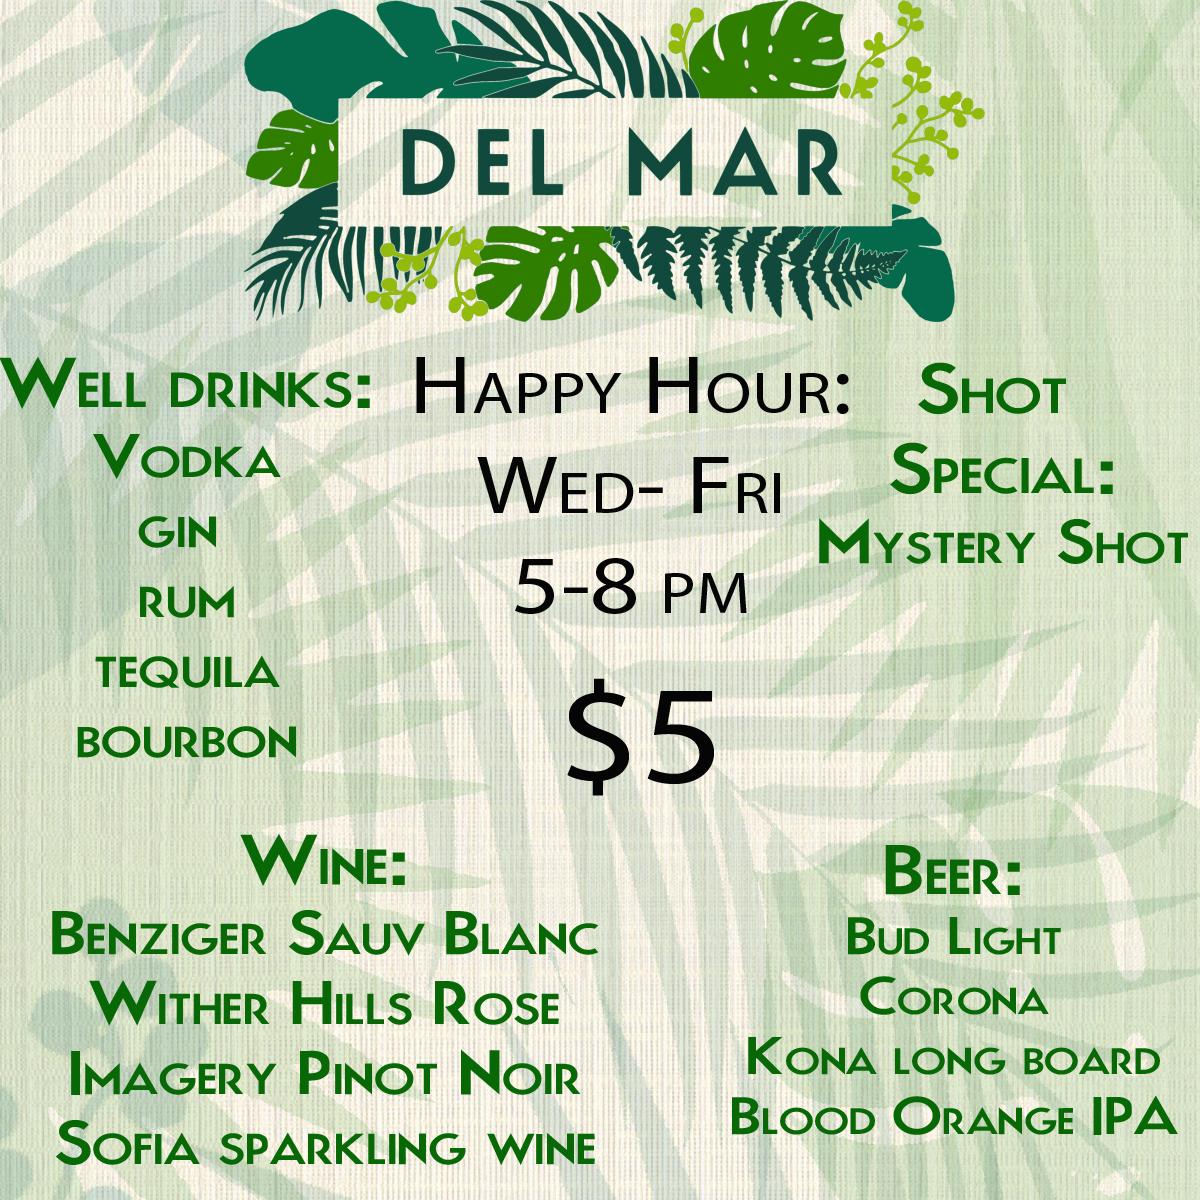 DELMARMENU Happy Hour menu stand.jpg